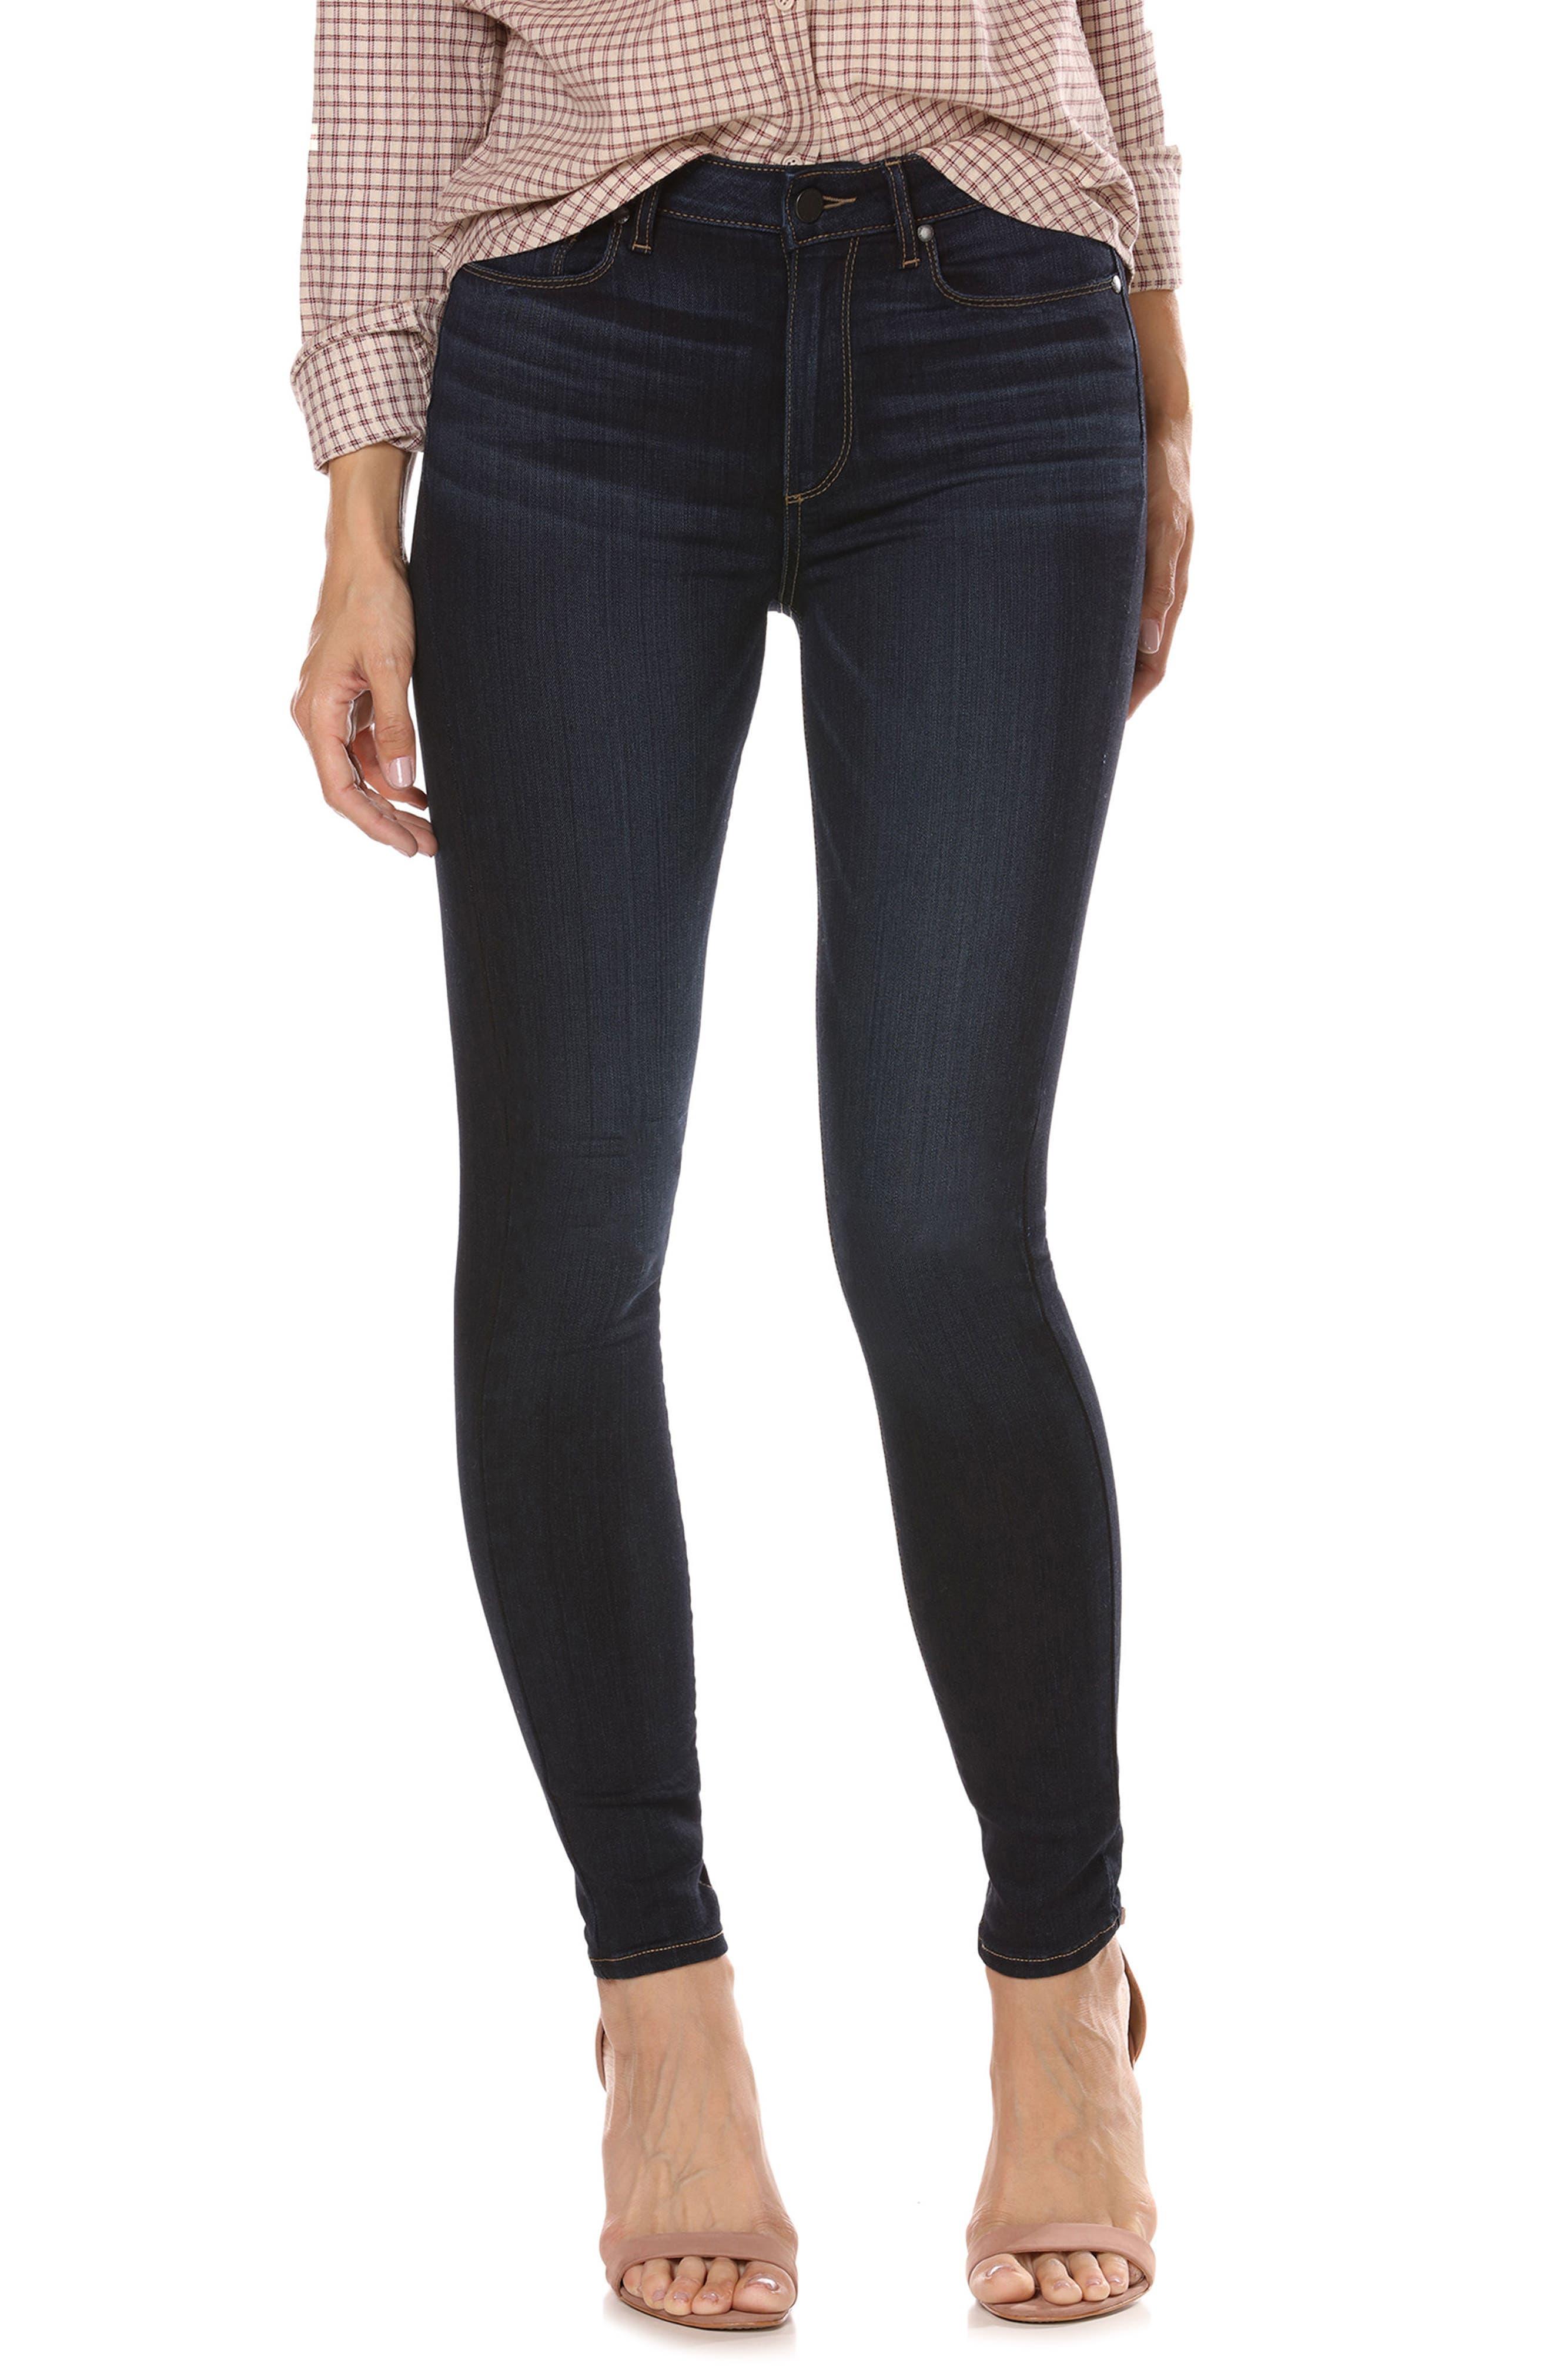 Transcend - Hoxton High Waist Ankle Skinny Jeans,                             Main thumbnail 1, color,                             Koda